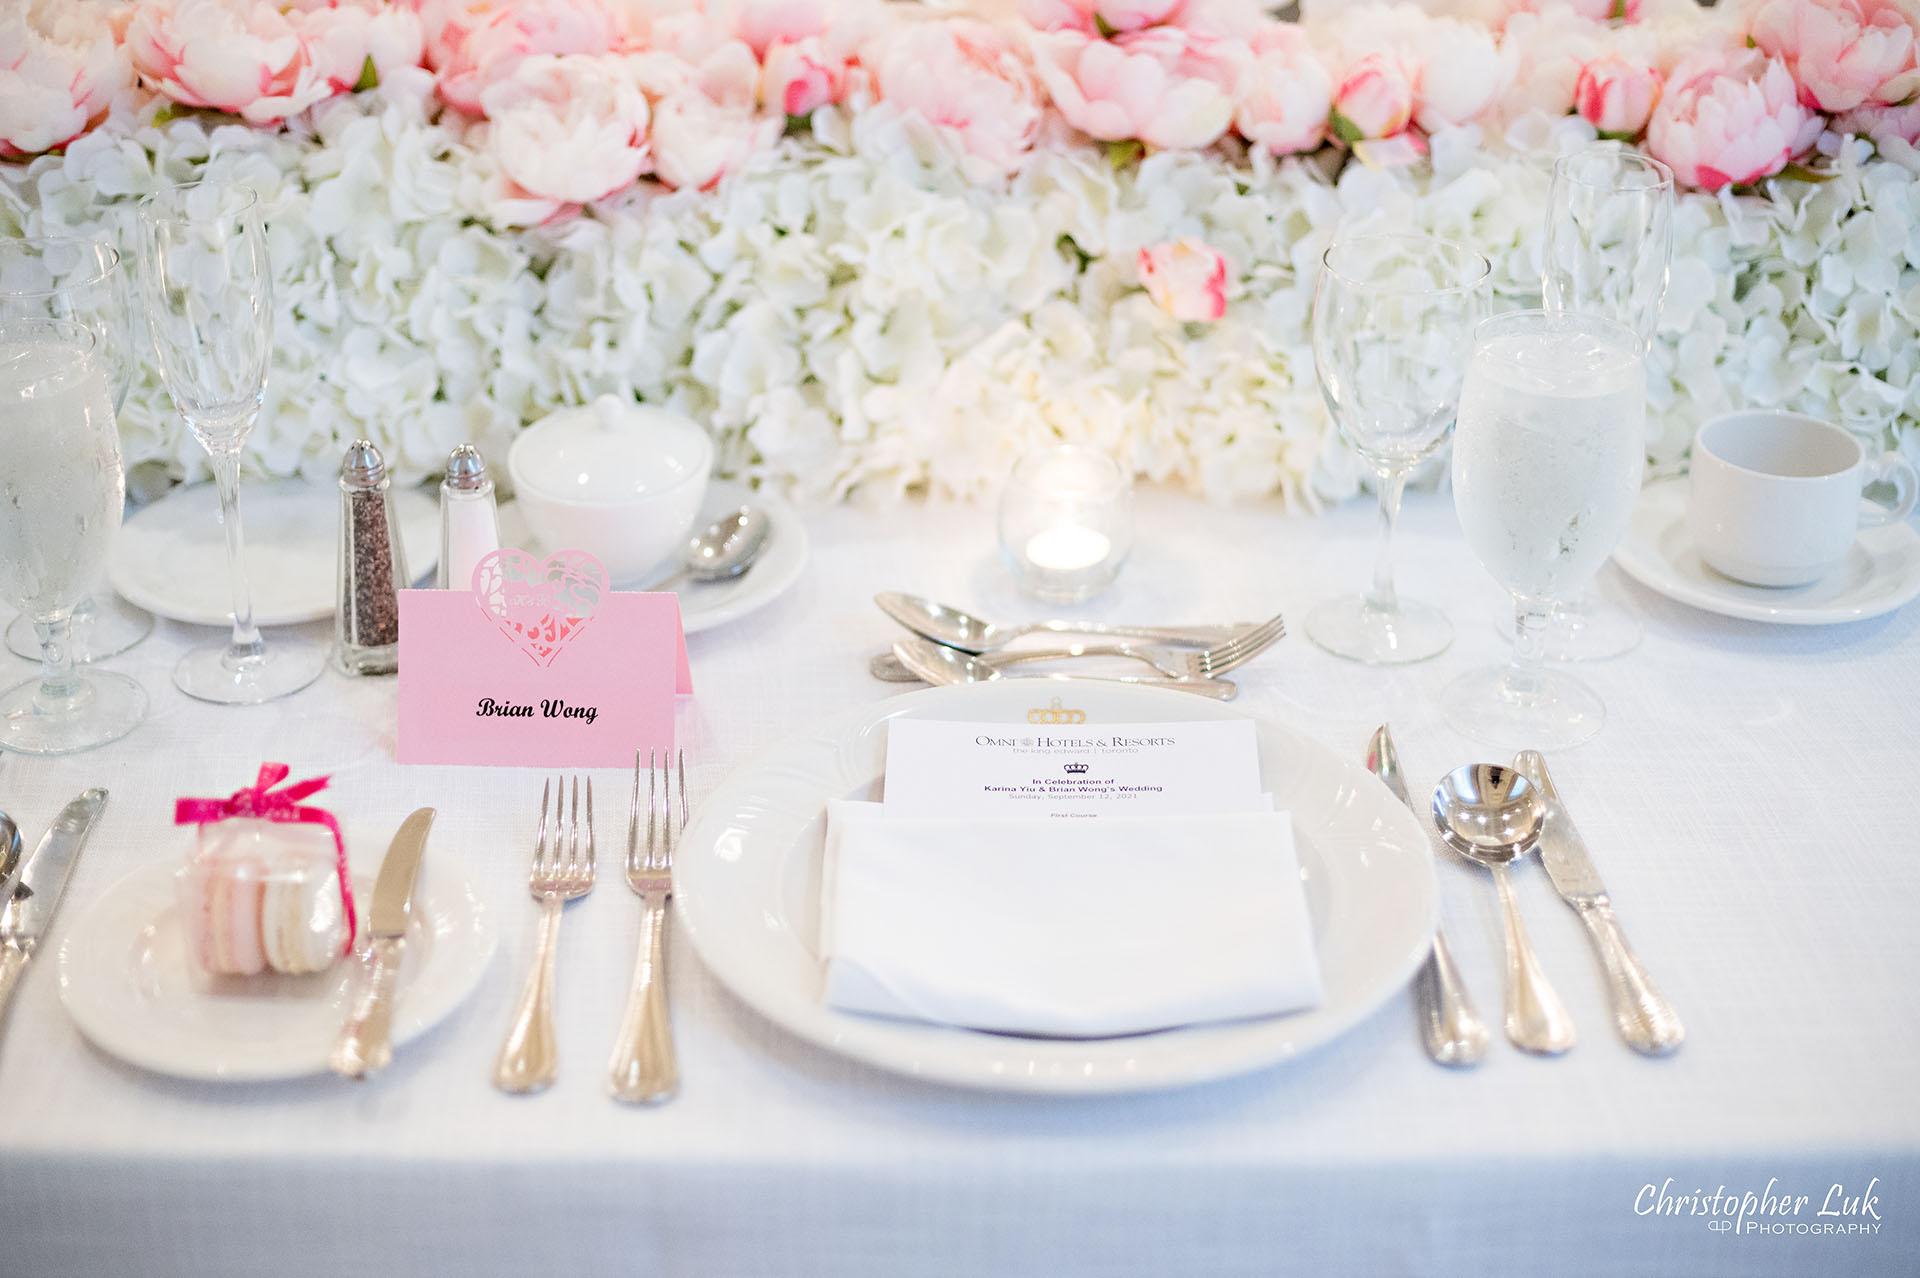 King Edward Hotel Crystal Ballroom Toronto Wedding Photographer MicroWedding Table Setting Decor Florist Flowers Menu